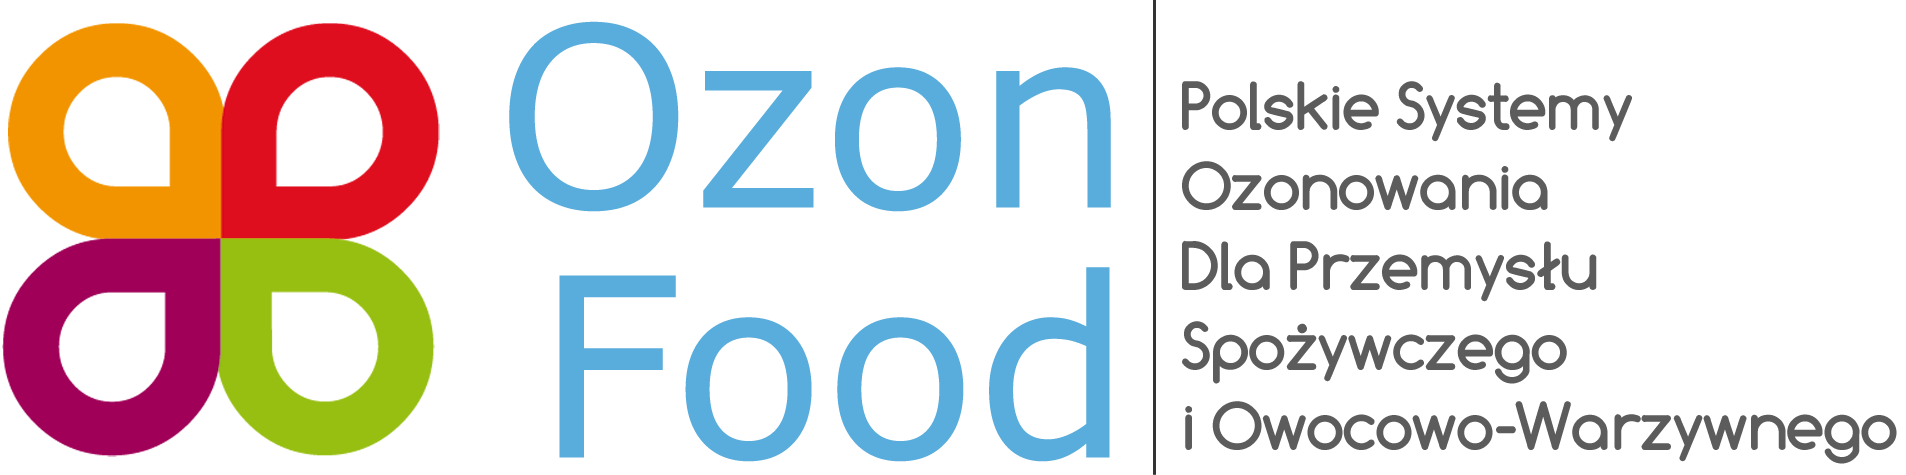 Ozon Food